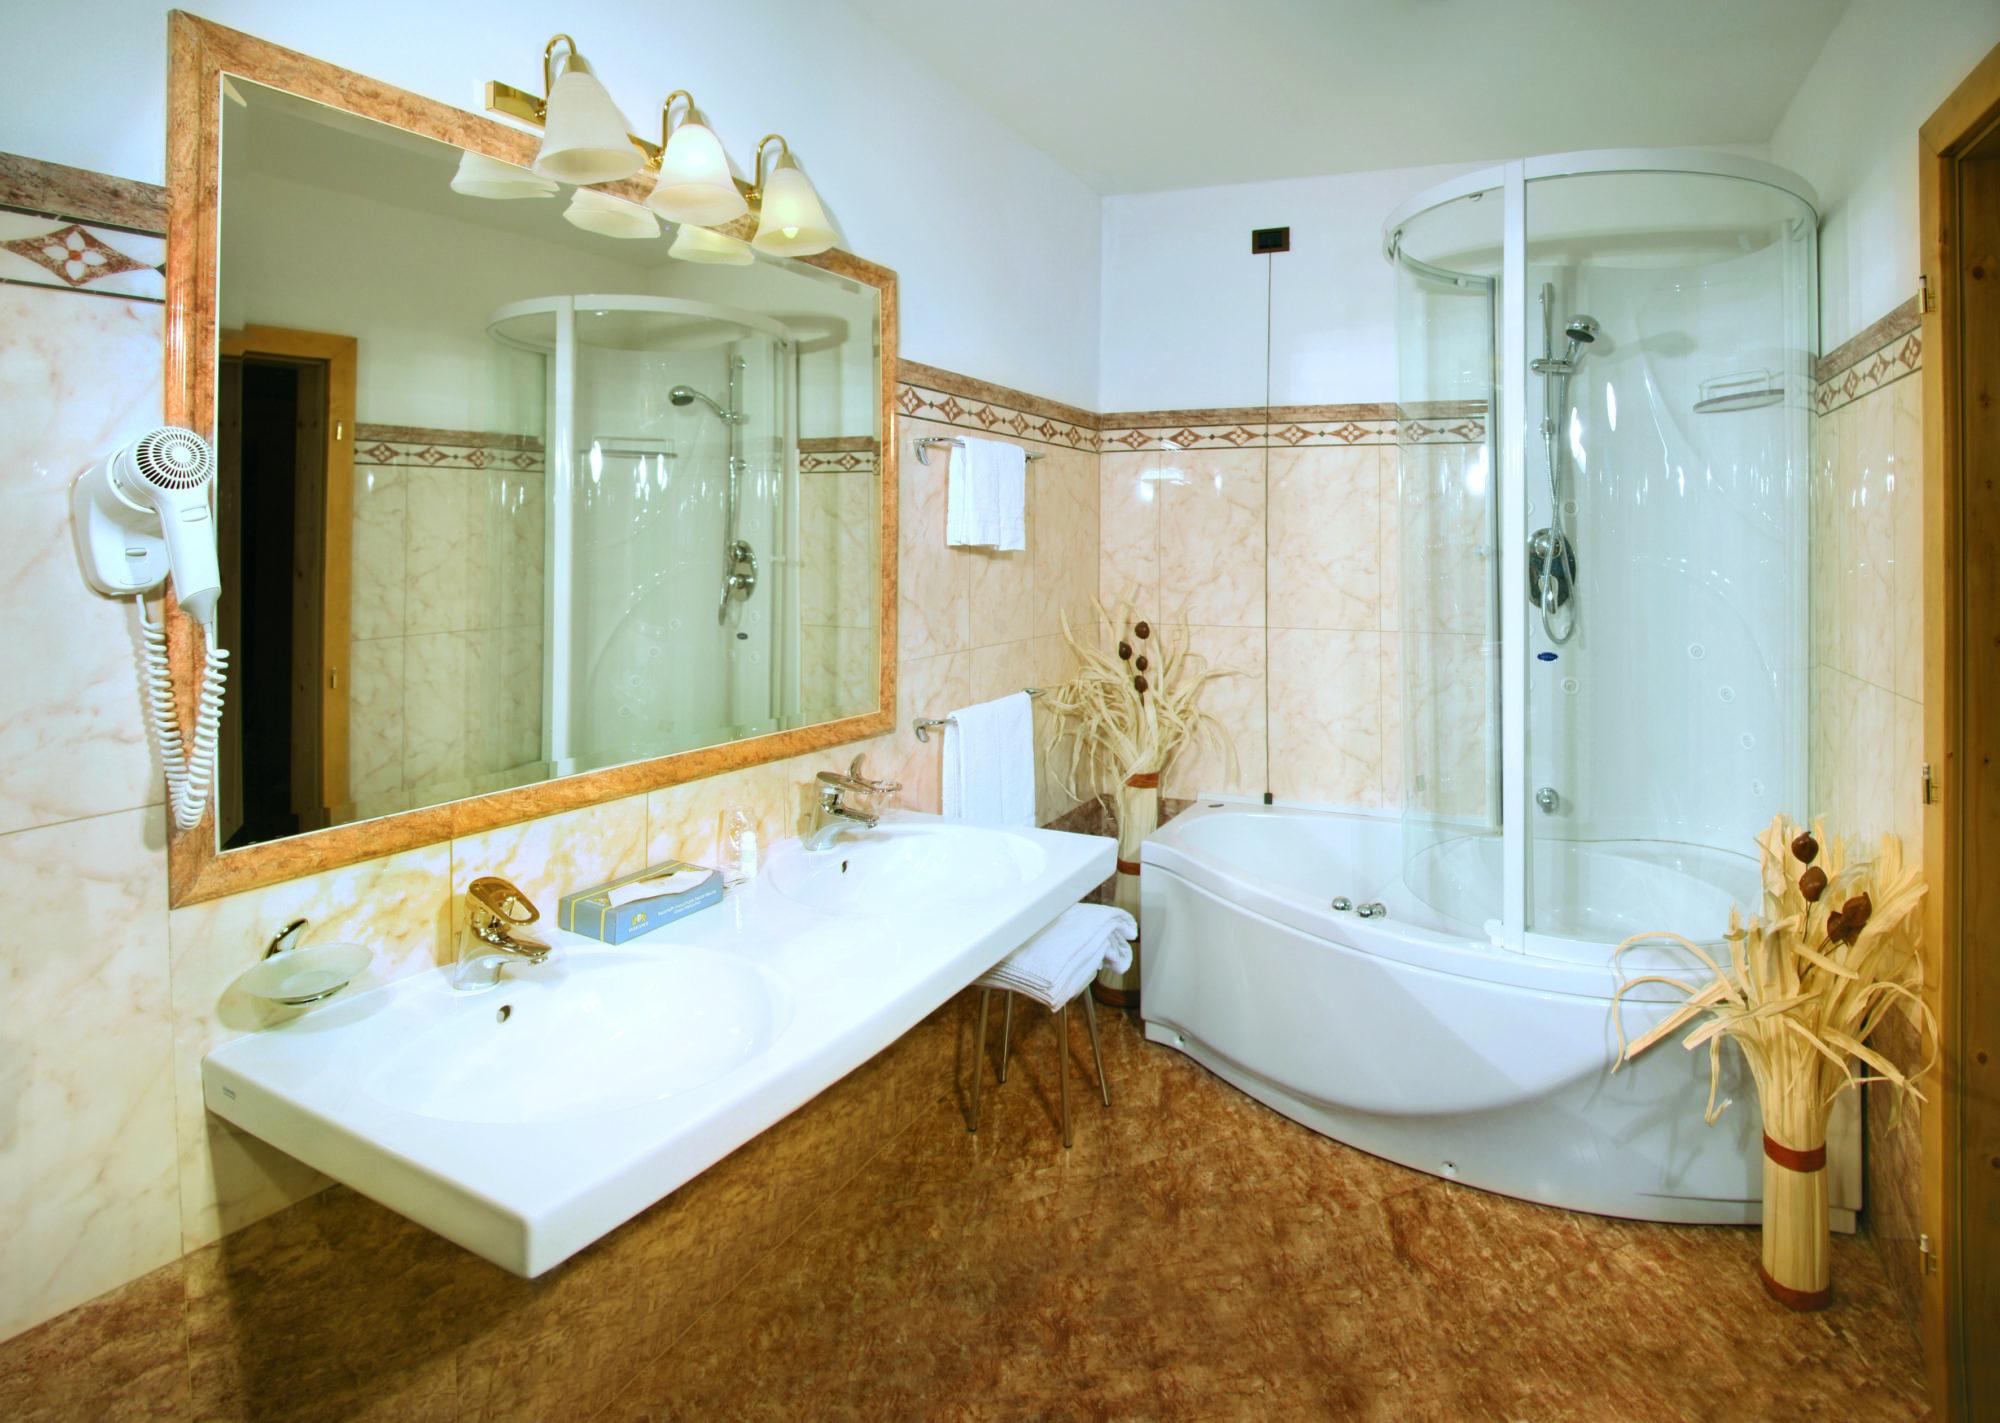 12 Hotel Diamant - bath room